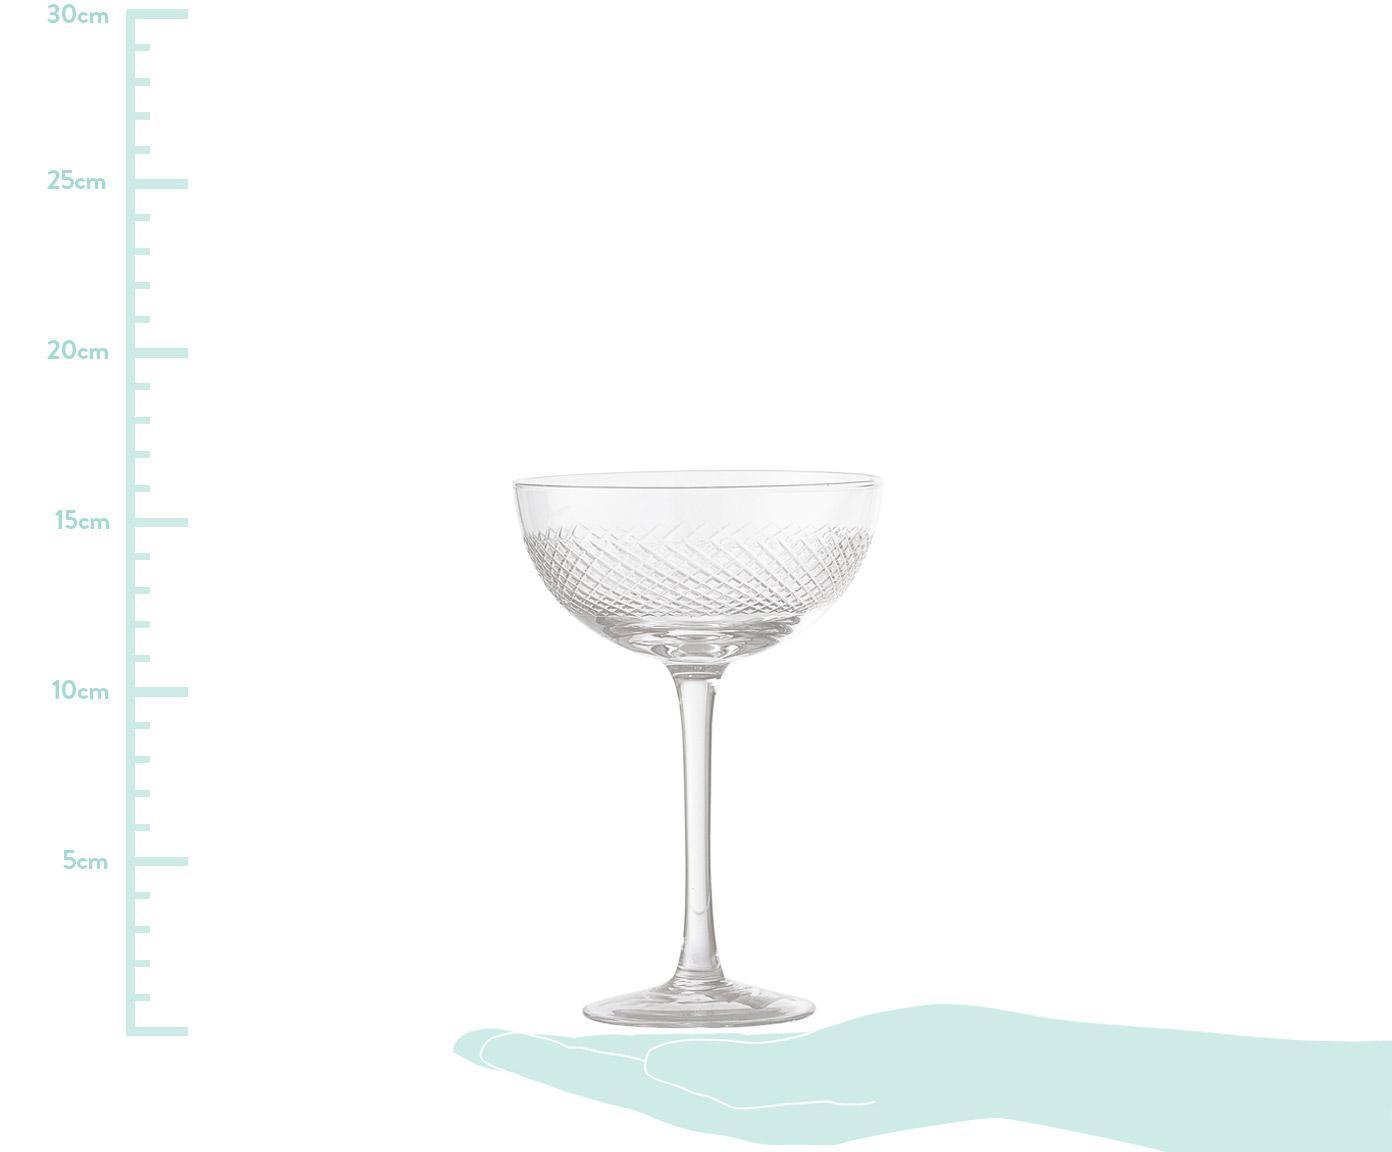 Champagneglazen Serena, 6 stuks, Glas, Transparant, wit, Ø 12 x H 16 cm